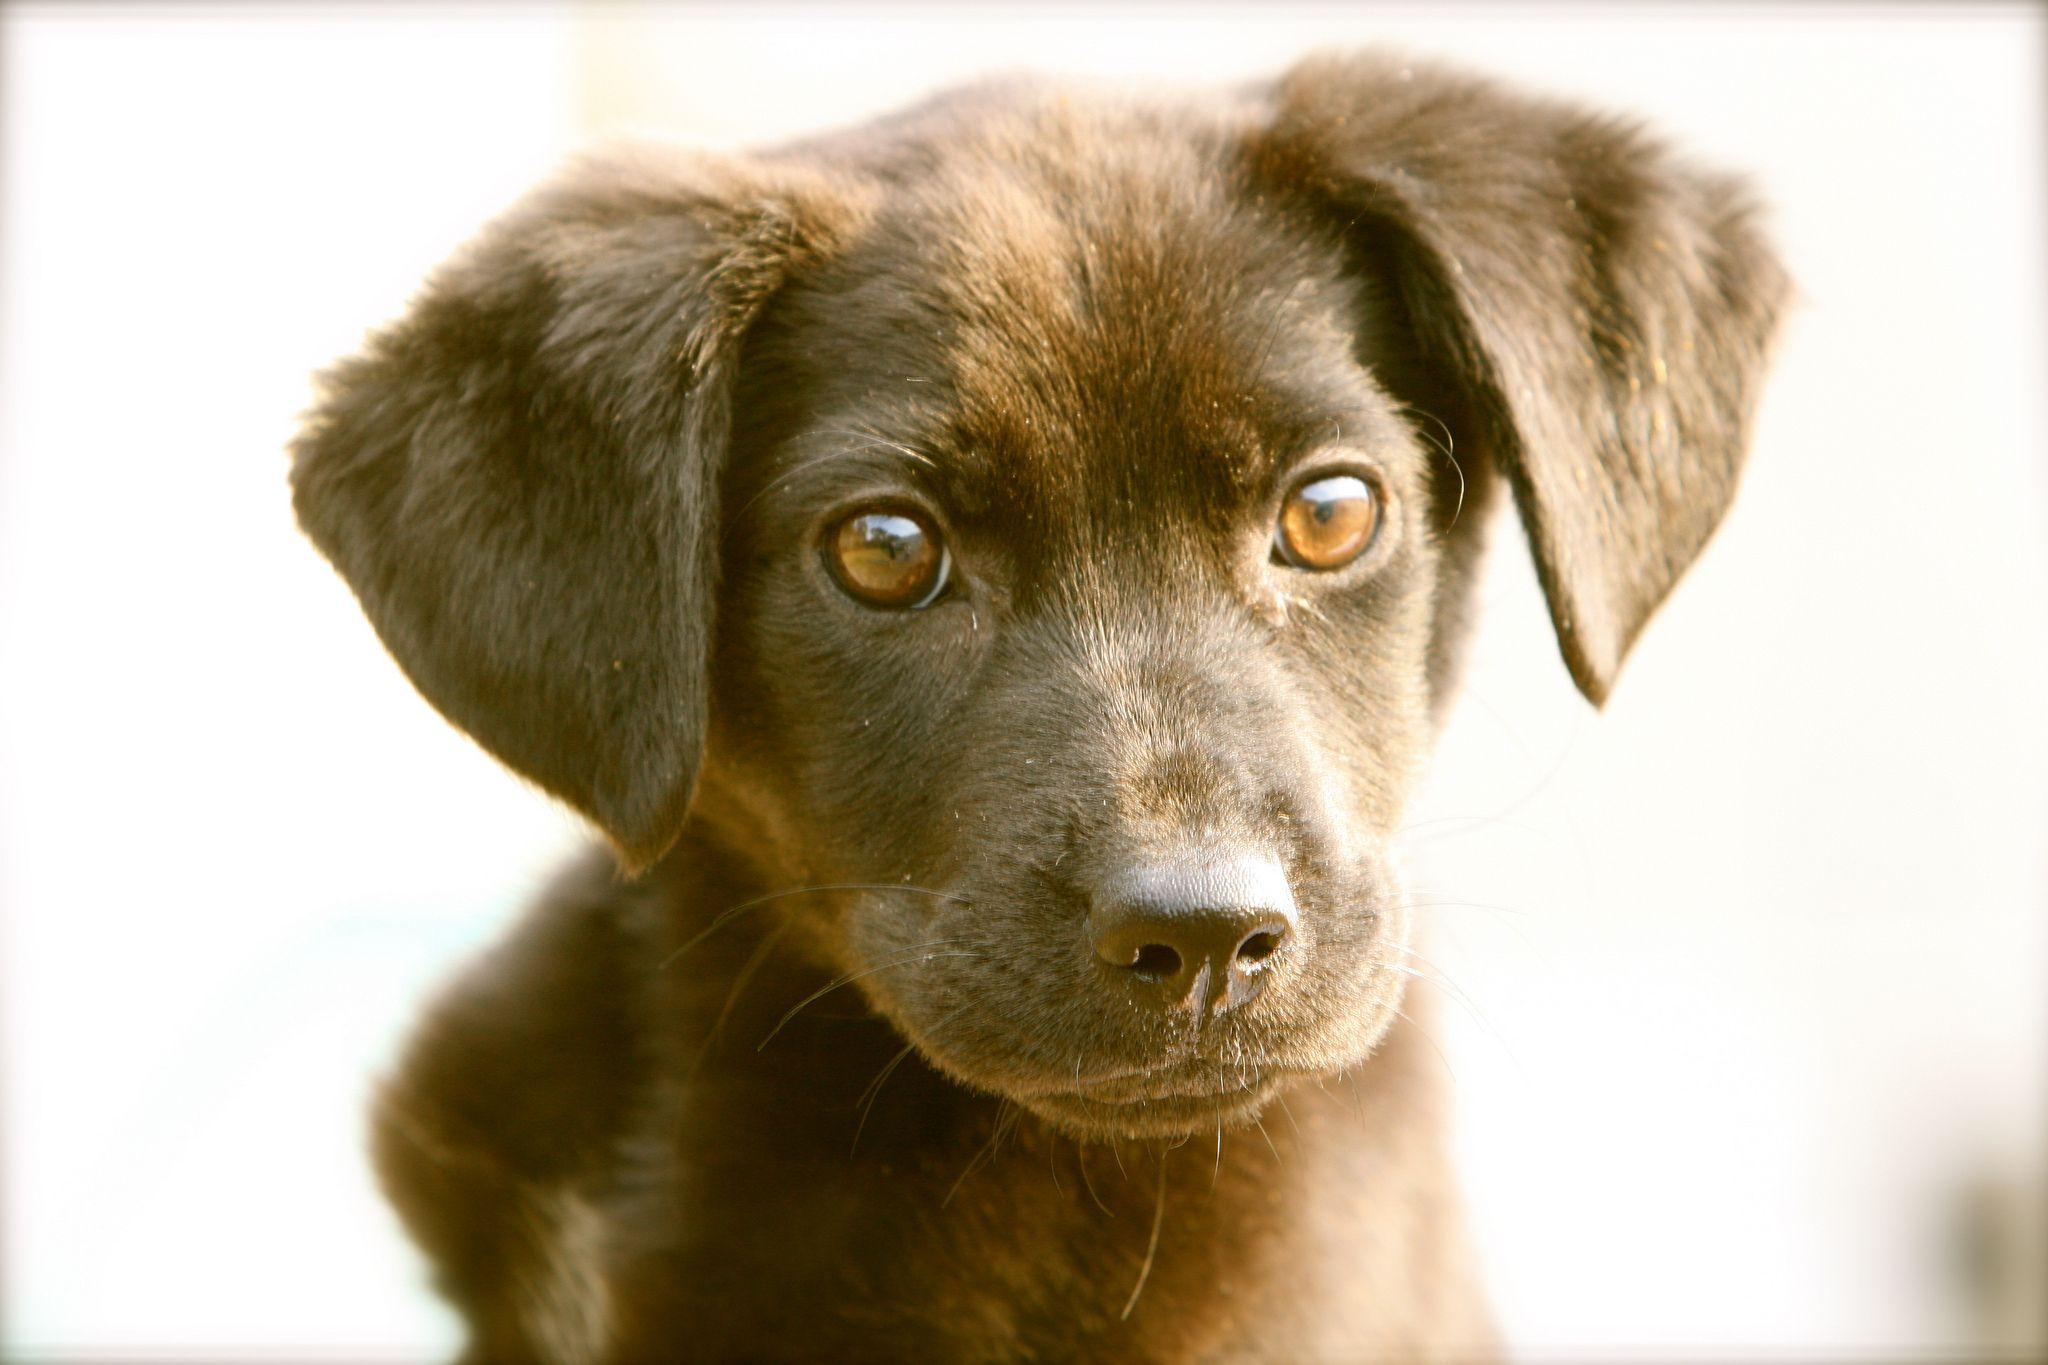 20 Ways to Save Big Bucks on Pet Supplies Teach dog to